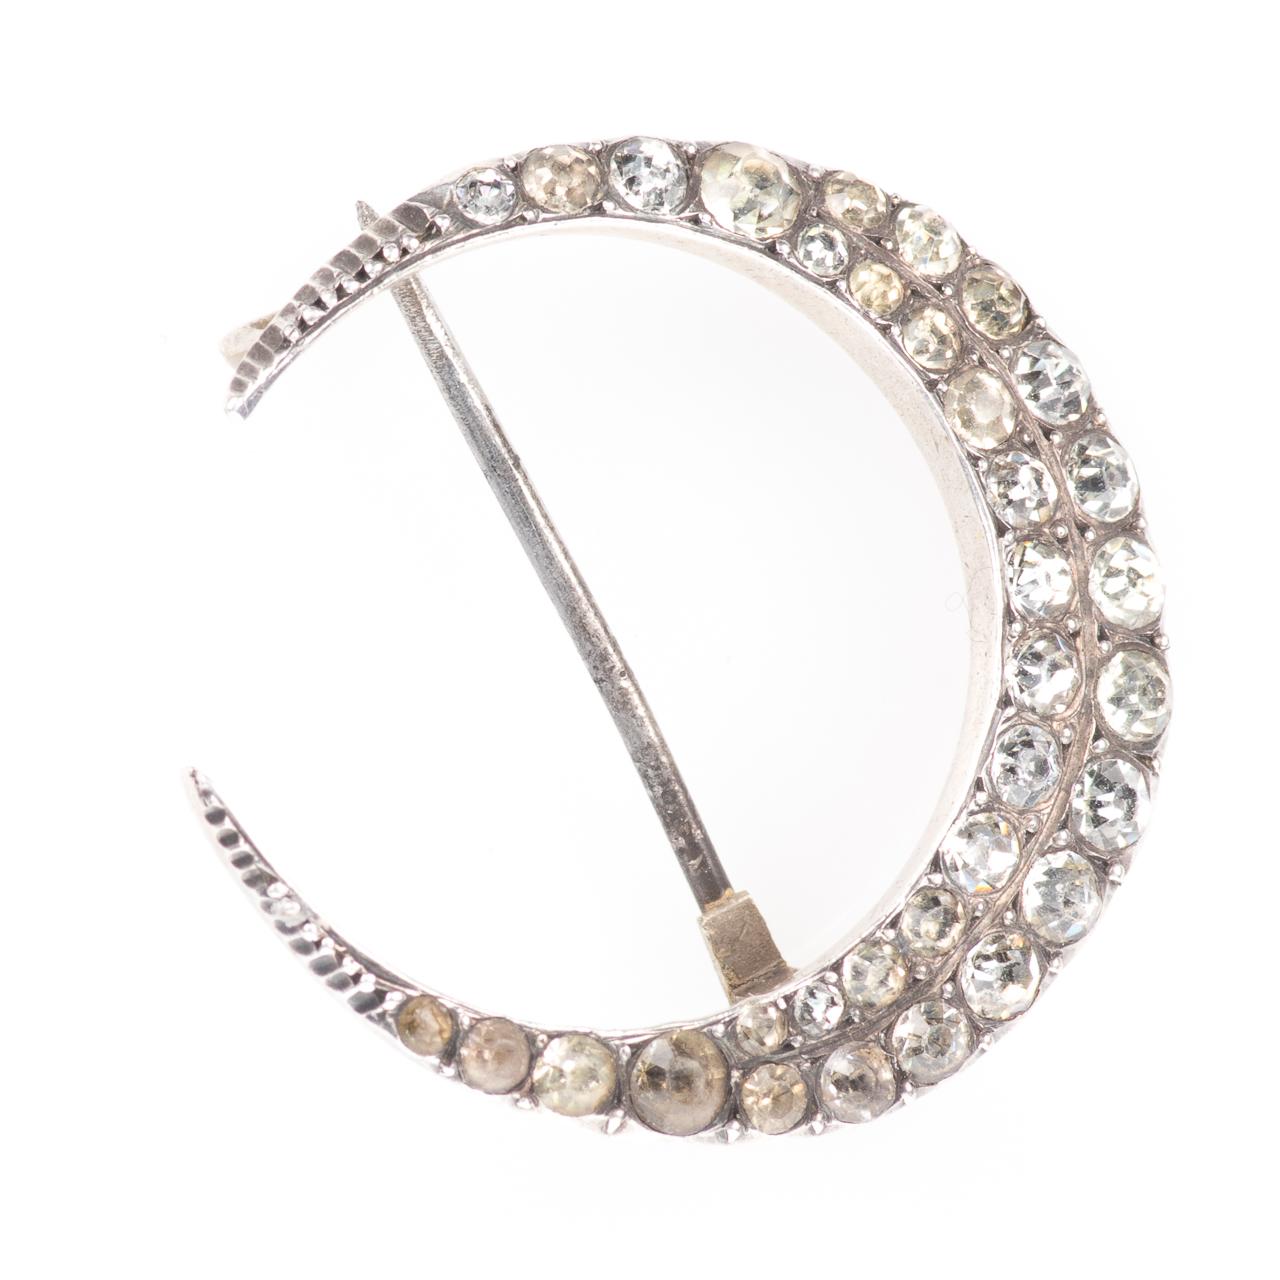 Victorian 900 Silver Paste Crescent Moon Brooch